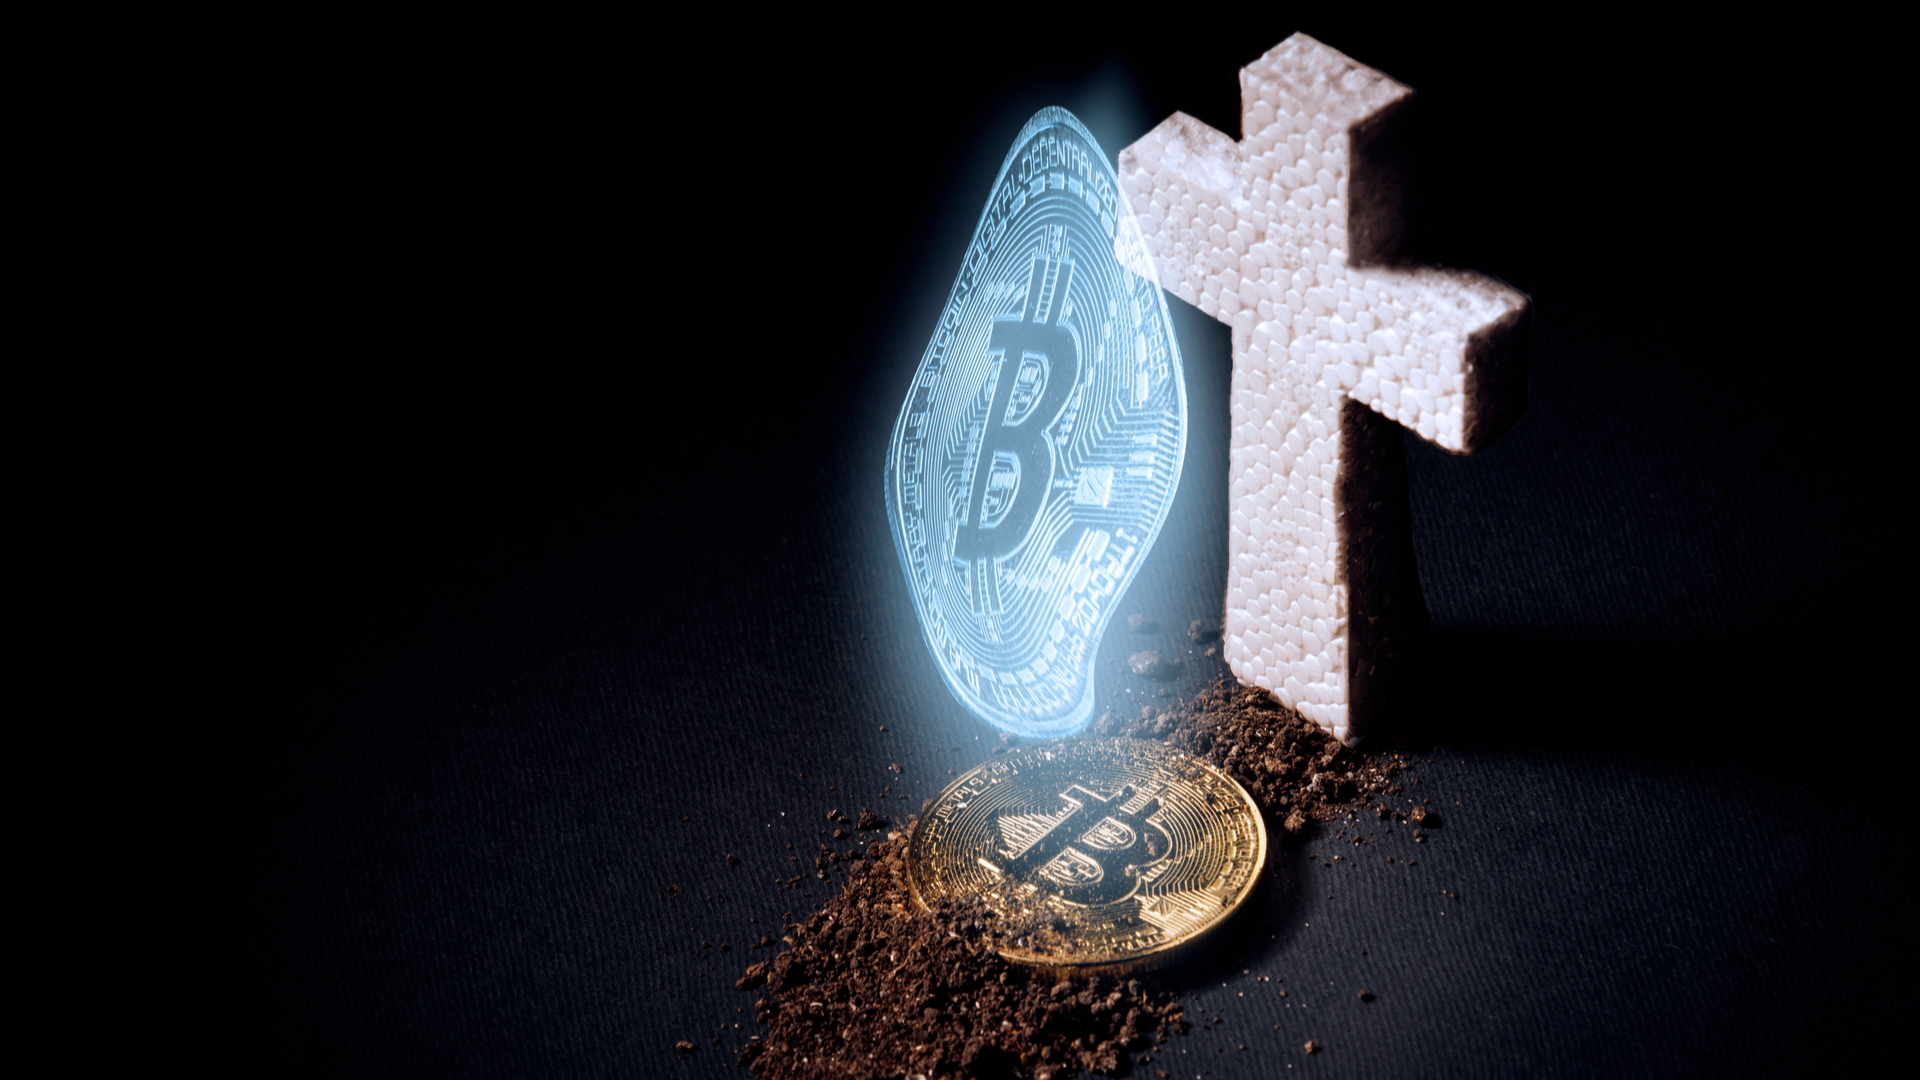 Quantas vezes o Bitcoin morreu? 37 só este ano